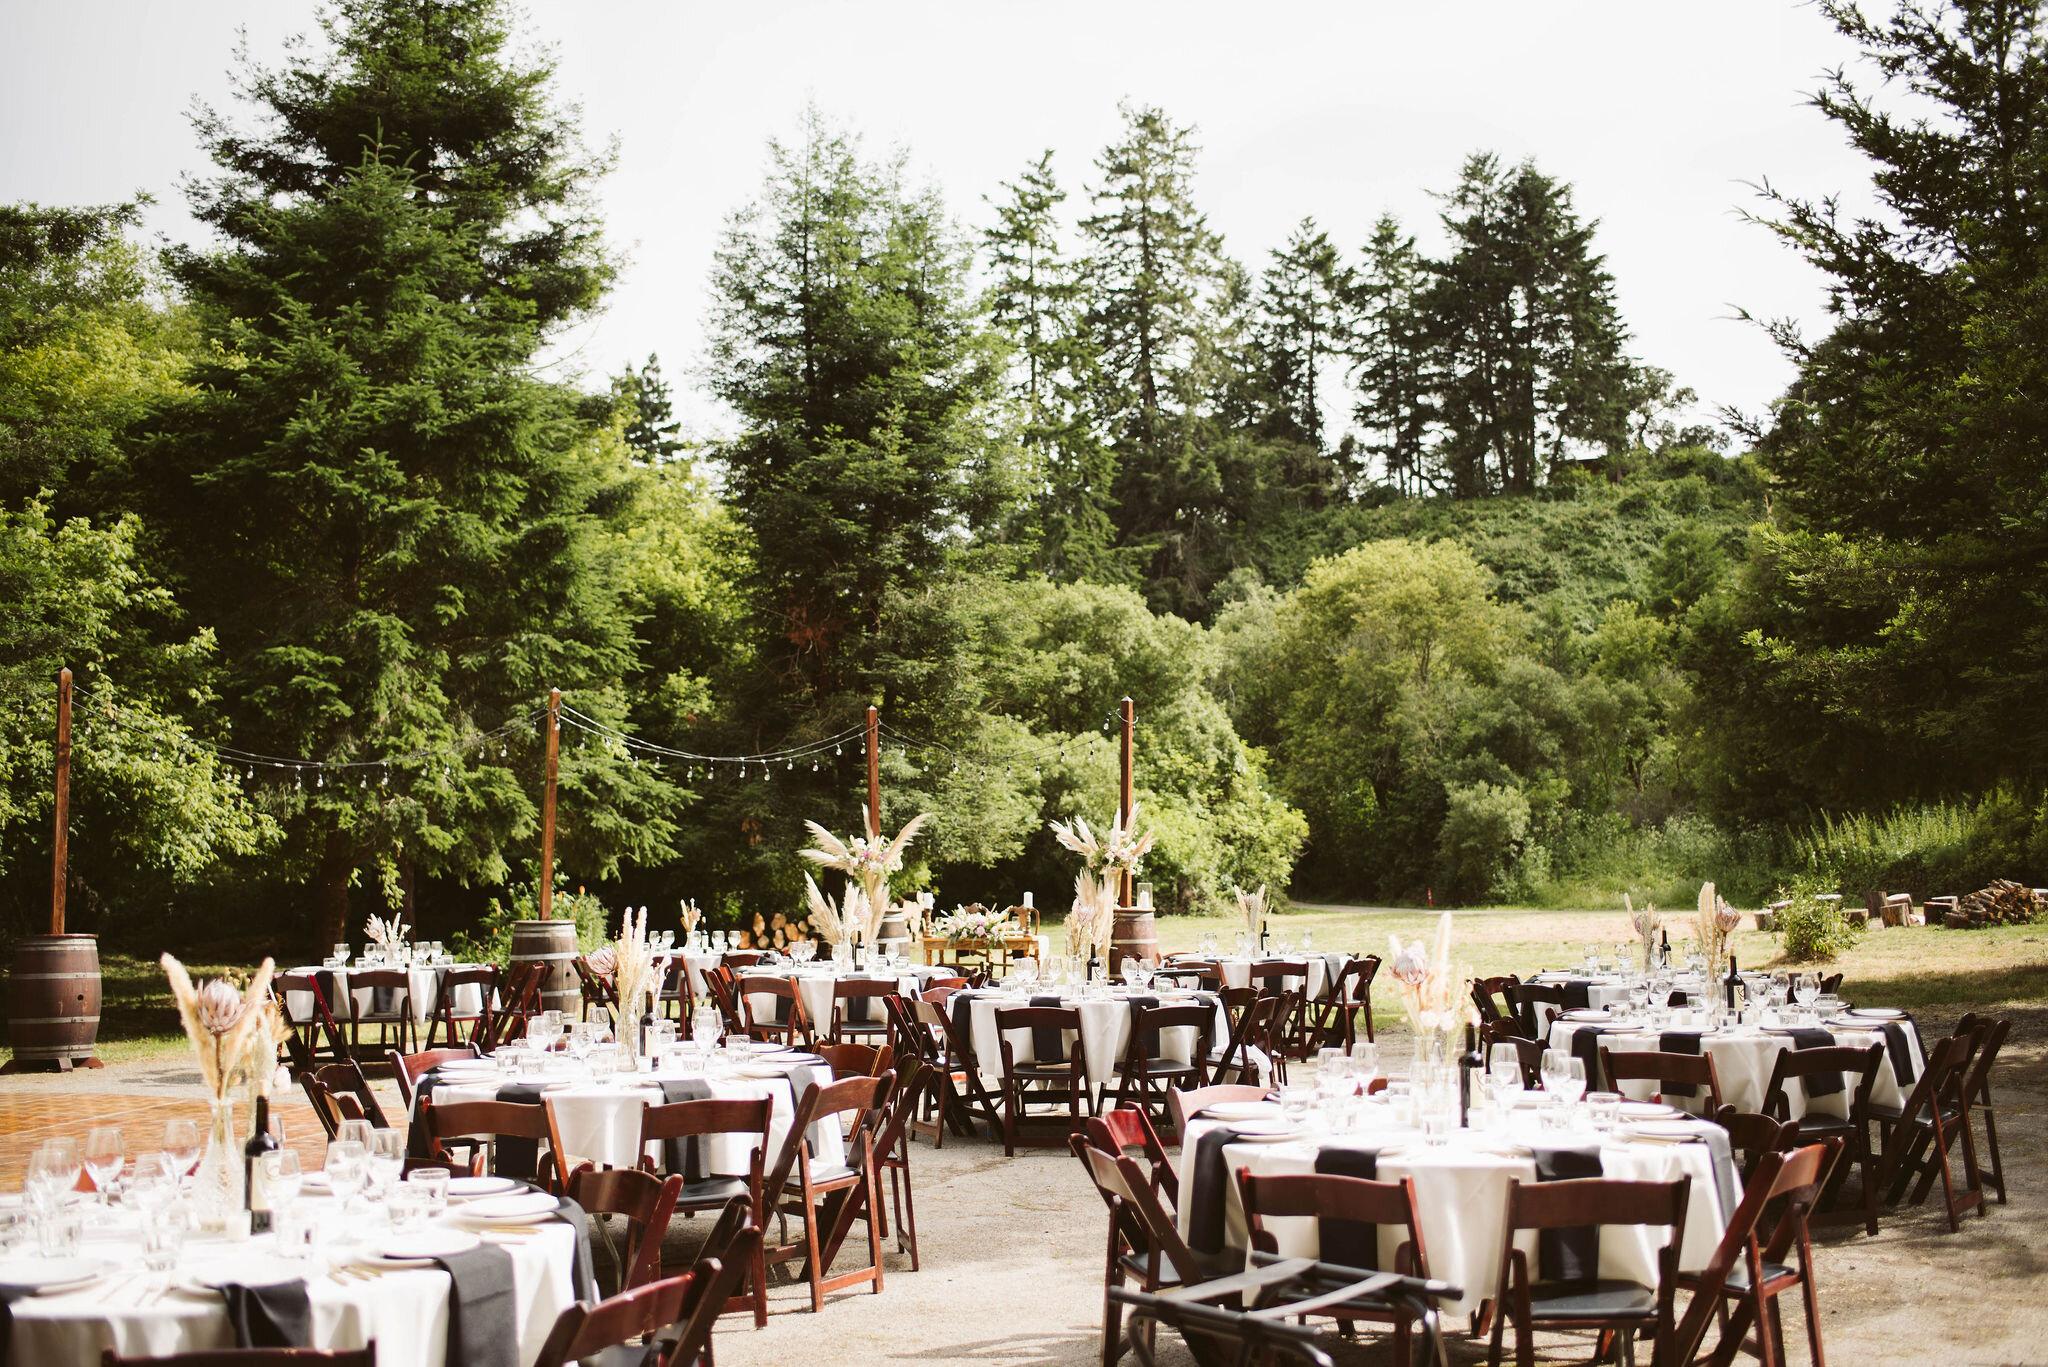 Venture-Retreat-Center-Wedding-Pescadero-Sat-Aaron-Pritam-The-Shalom-Imaginative-522.jpg